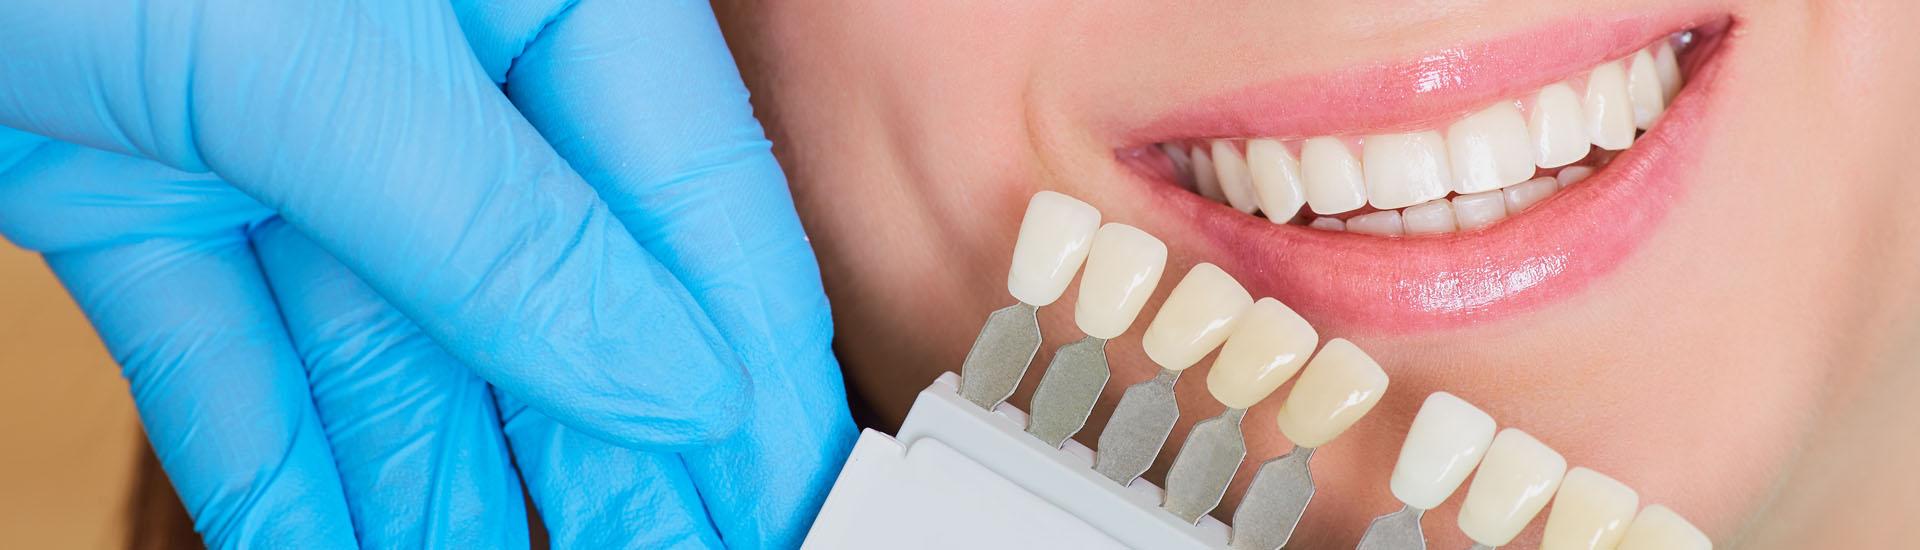 Dentiris blanchiment dentaire à Lausanne